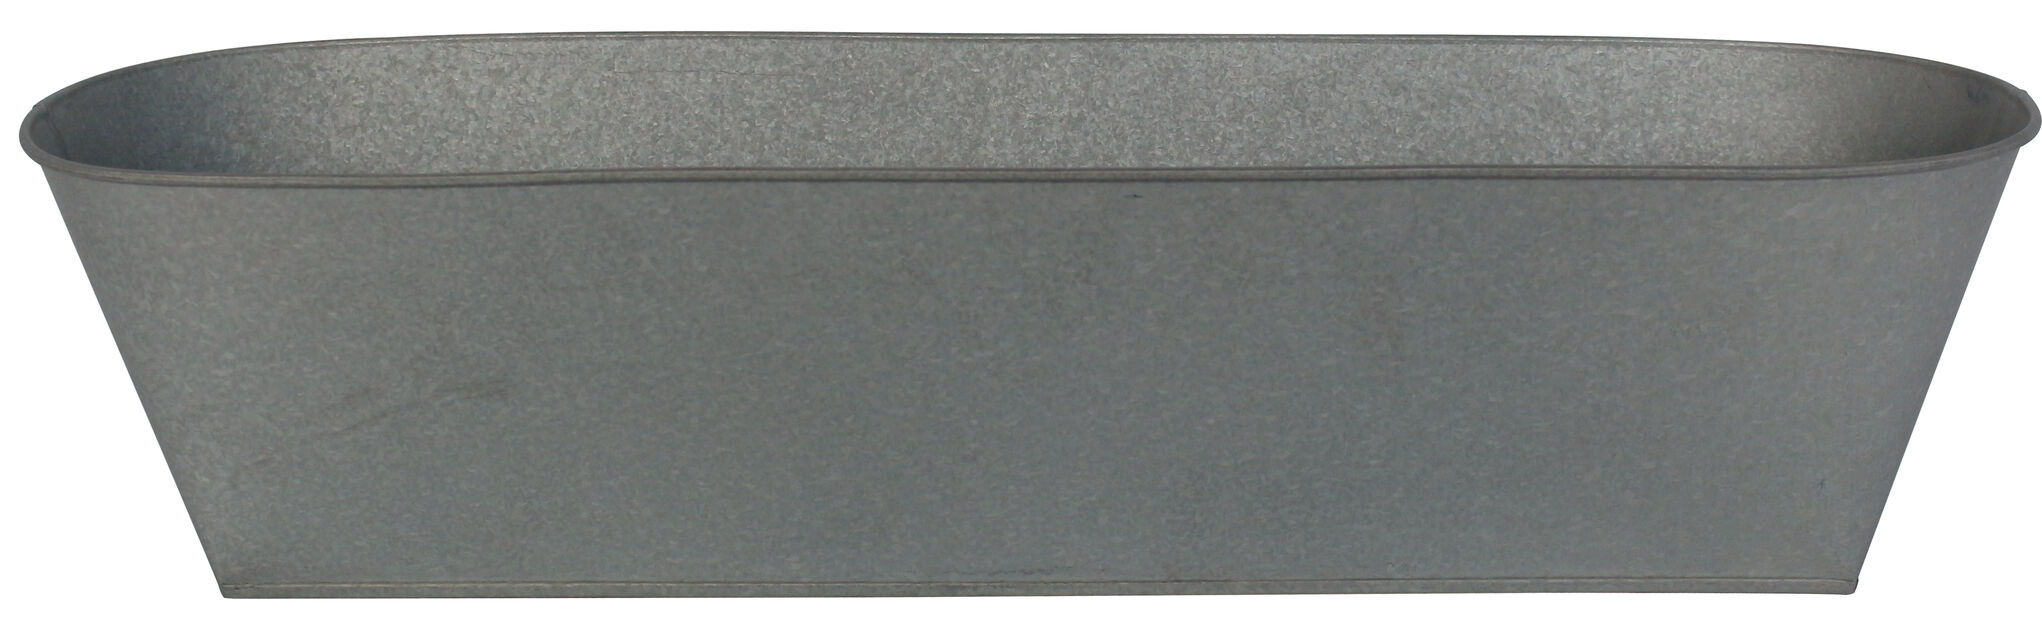 Balkonglåda Mario 61,5 cm zink